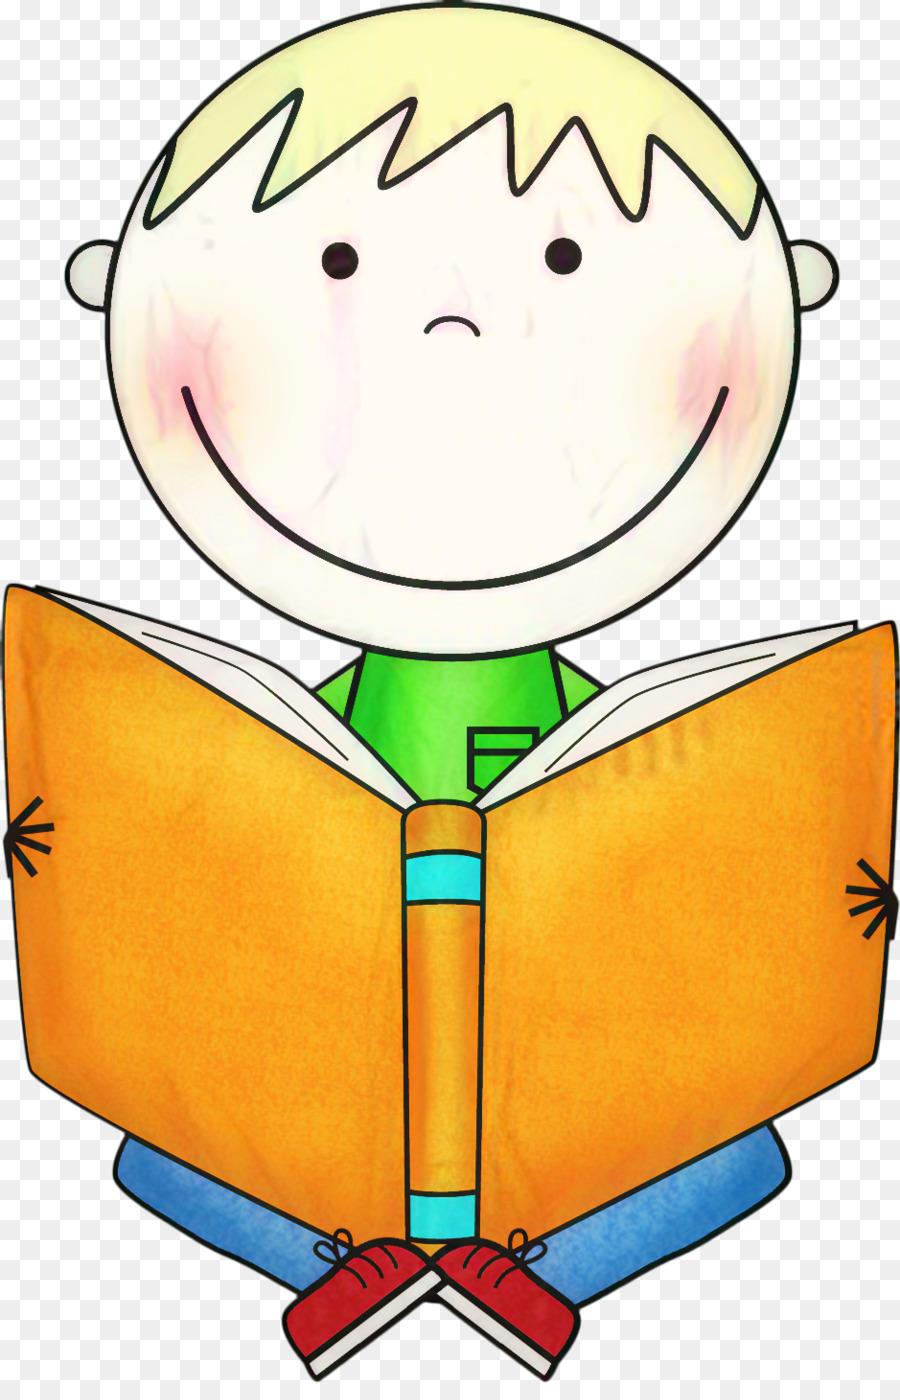 Clip Art Belajar : belajar, Student, Cartoon, Download, 939*1445, Transparent, Smile, Download., CleanPNG, KissPNG